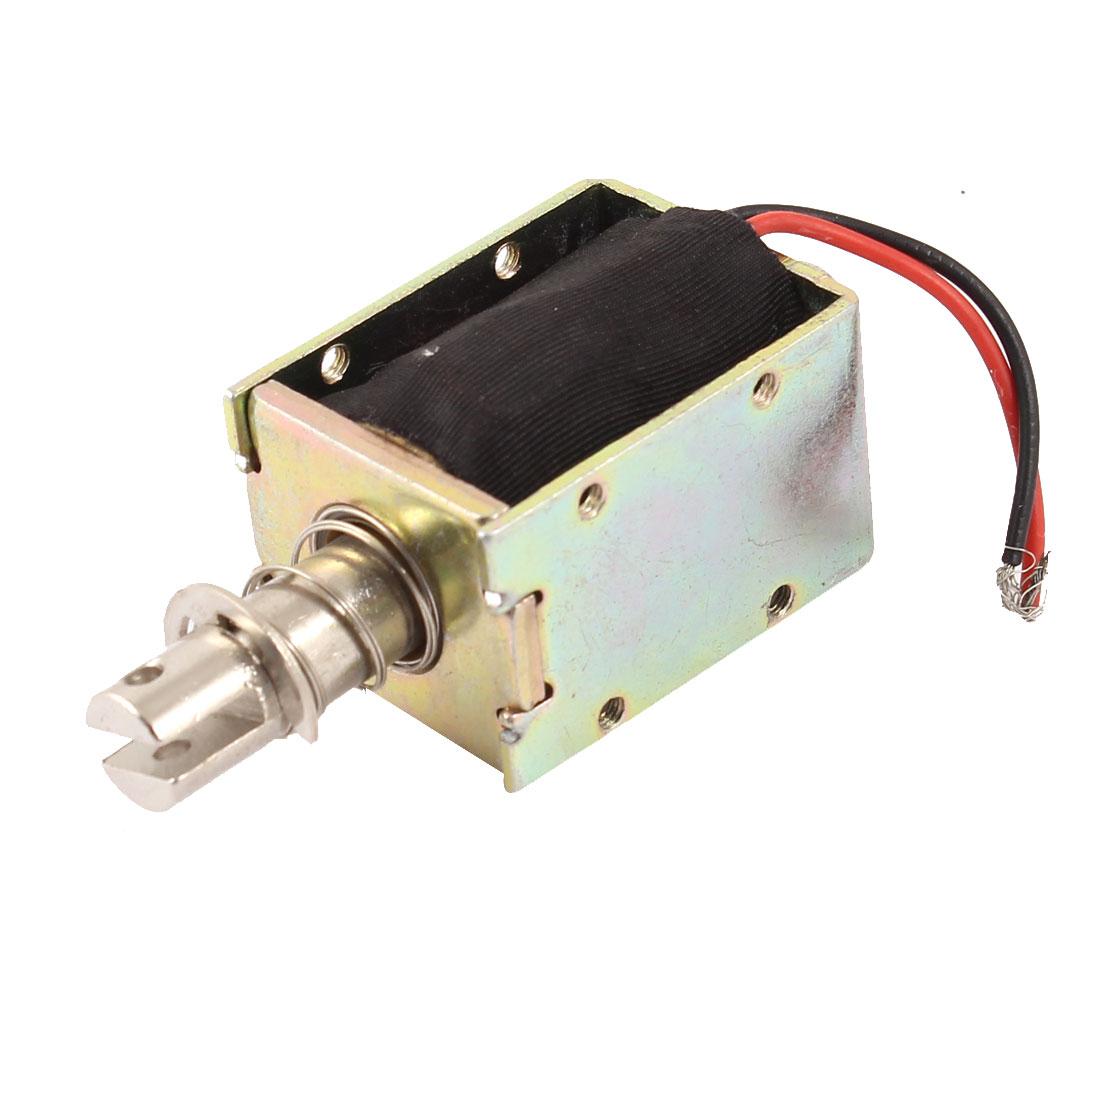 6mm Stroke 0.3Kg Holding Force 5.76W Pull Push Type Solenoid Electromagnet DC 12V